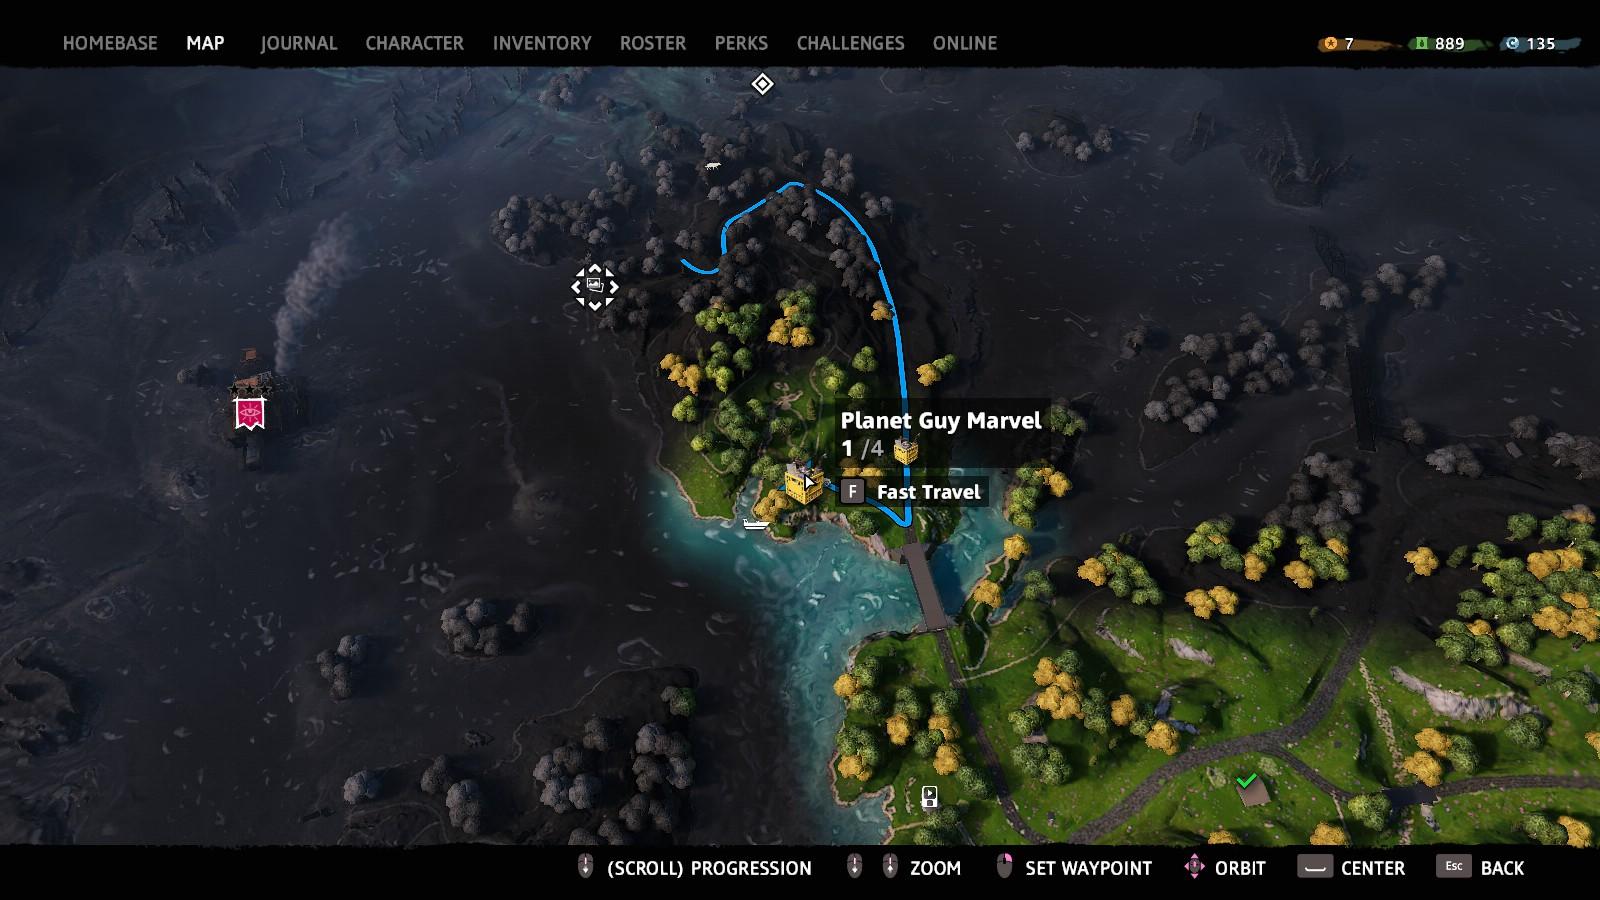 Farcry New Dawn Map Far Cry New Dawn Guide 2020 11 02